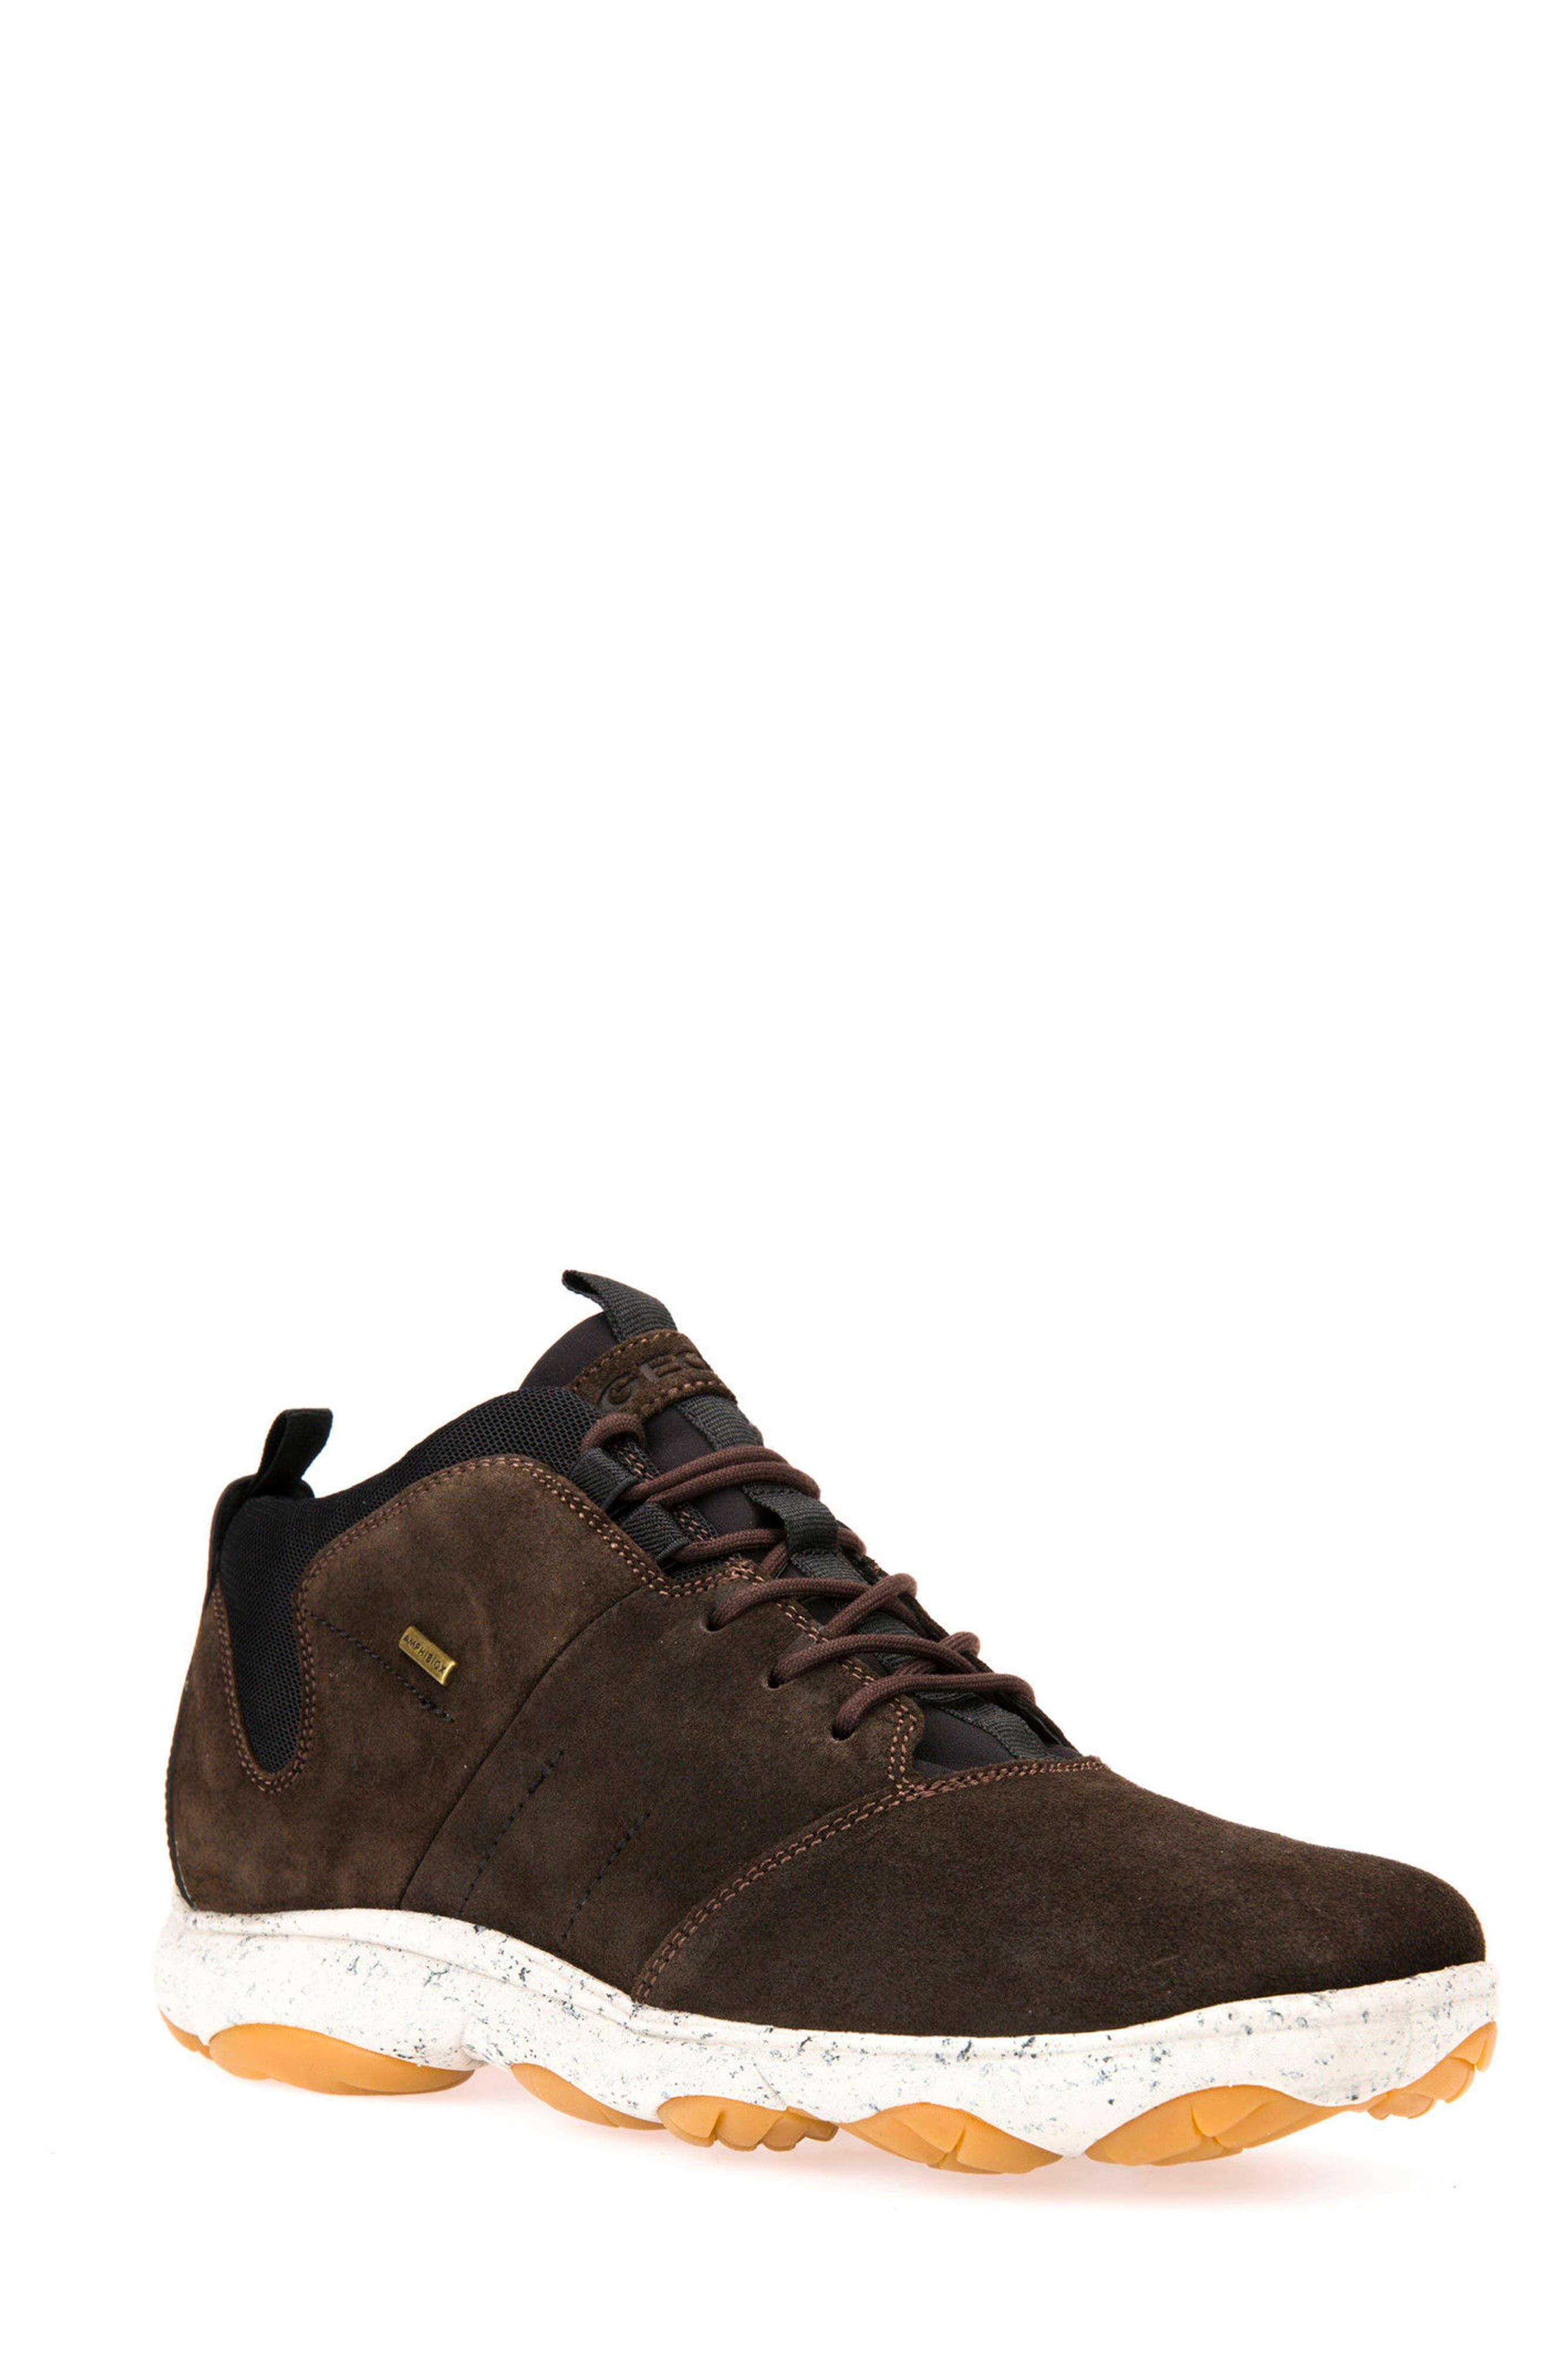 Geox Nebula 4x4 Boot (Men)